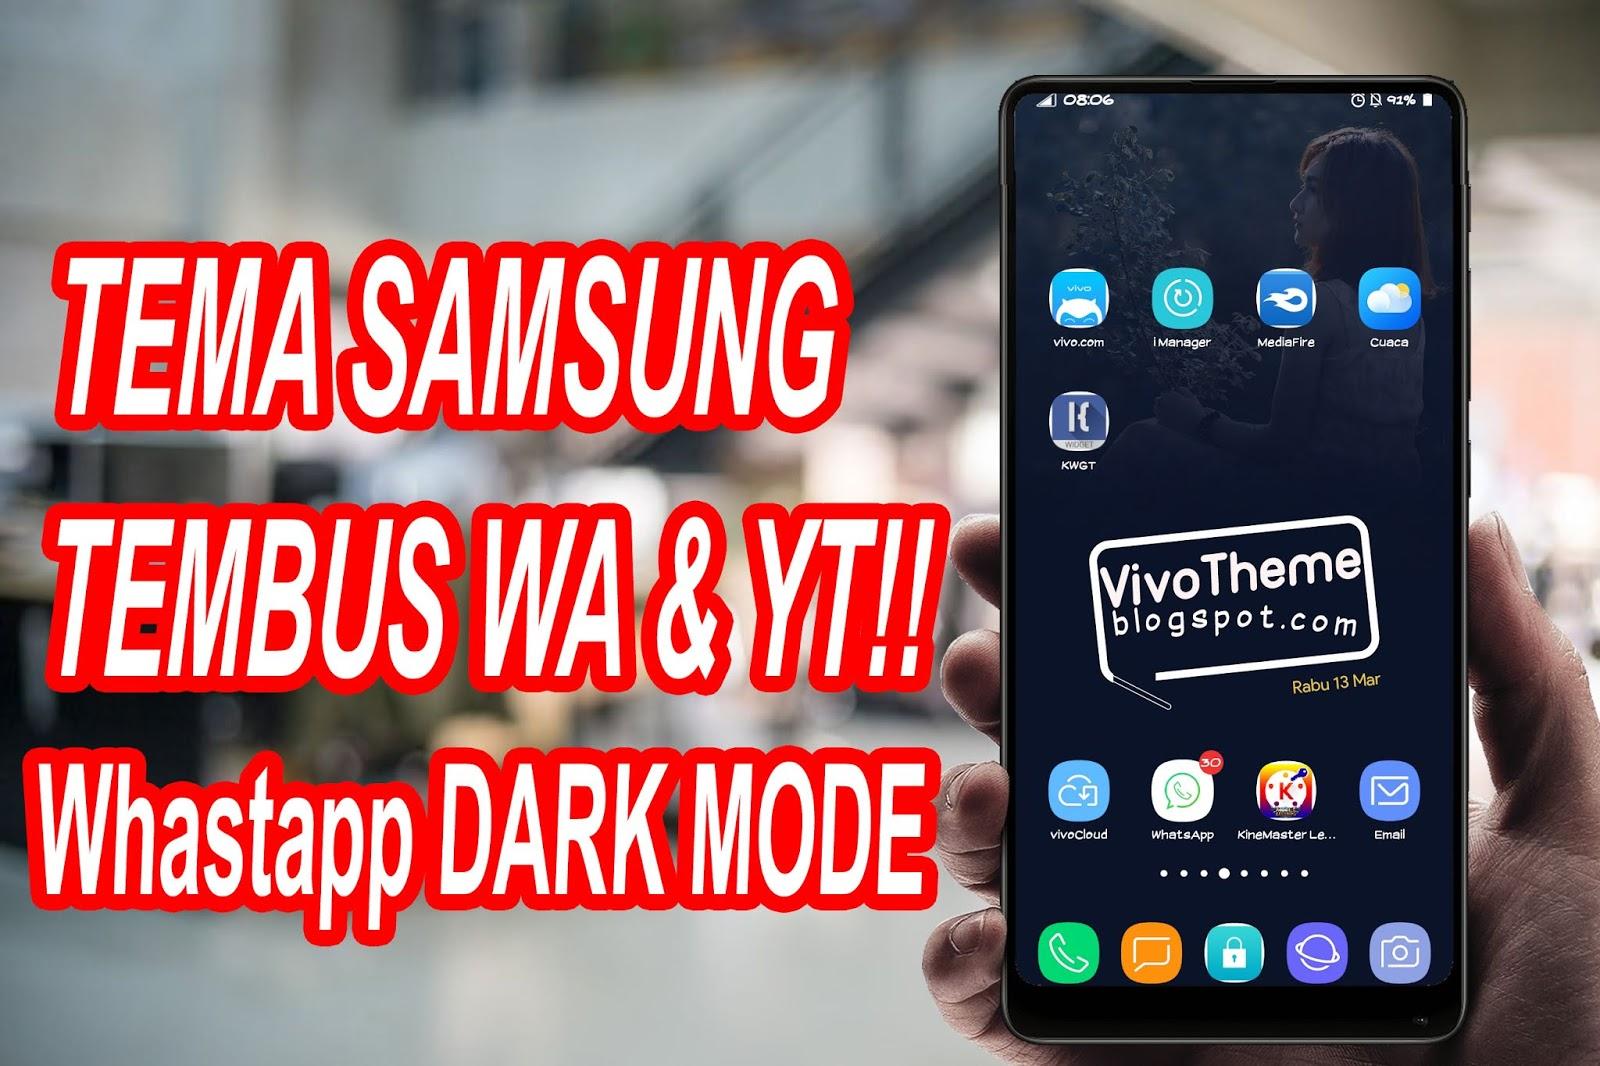 New Samsung Theme For Vivo Smartphone - Theme VIVO Terbaru